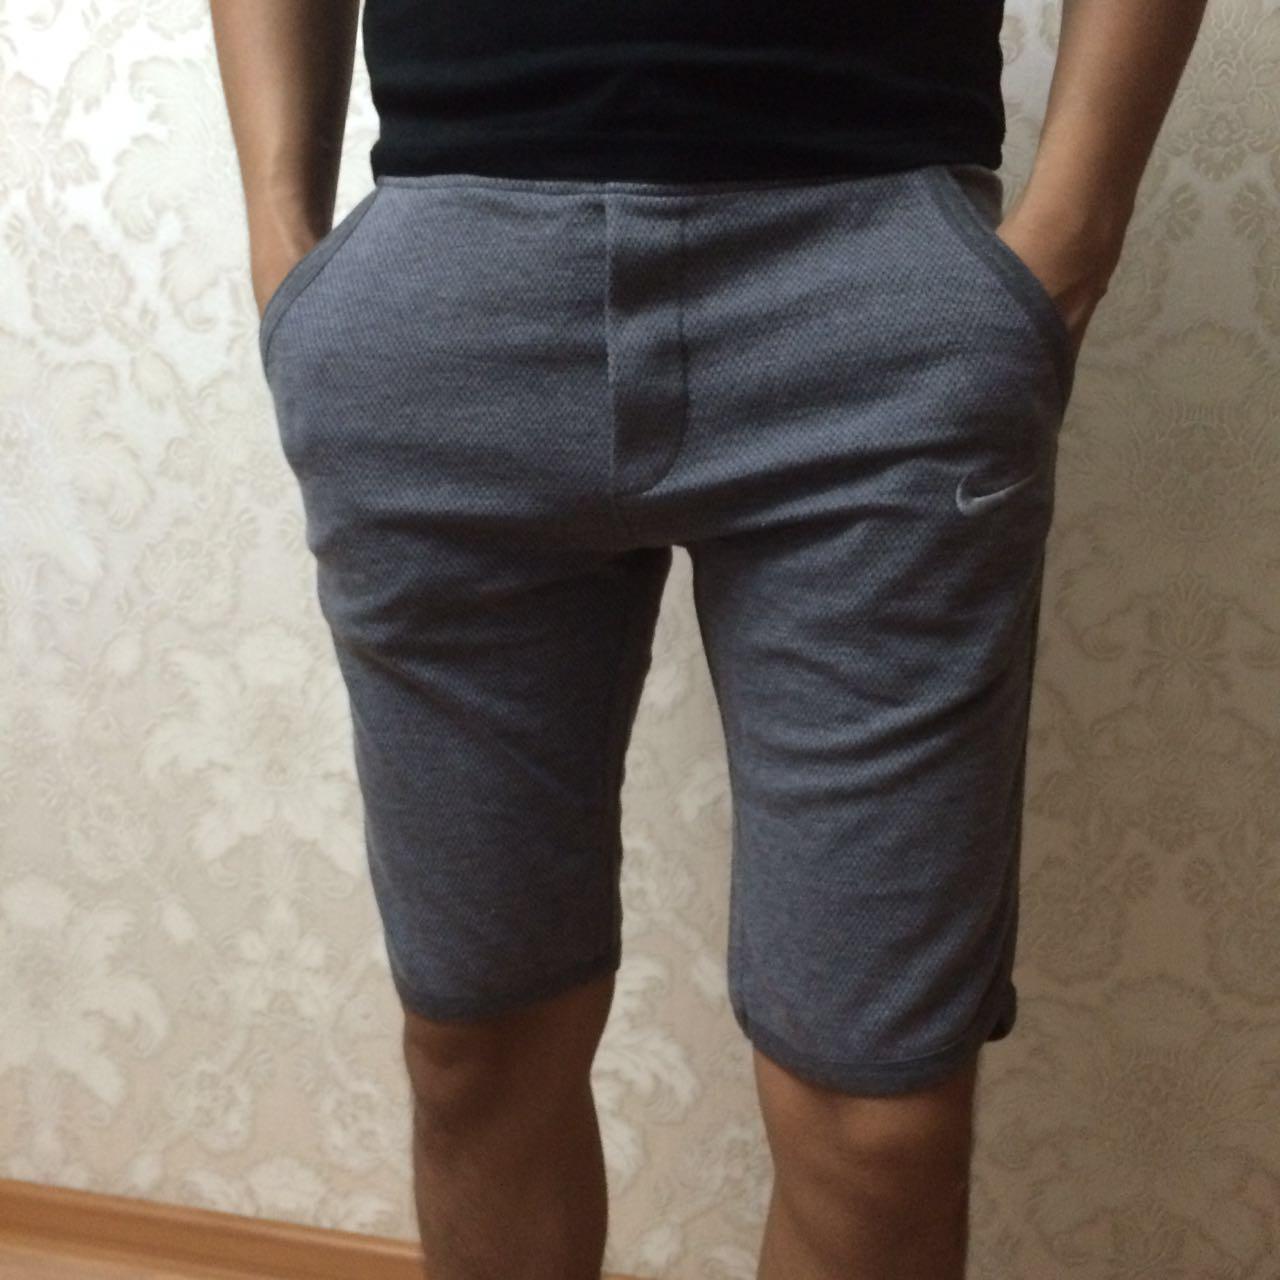 Турецкие шорты Nike - фото 3